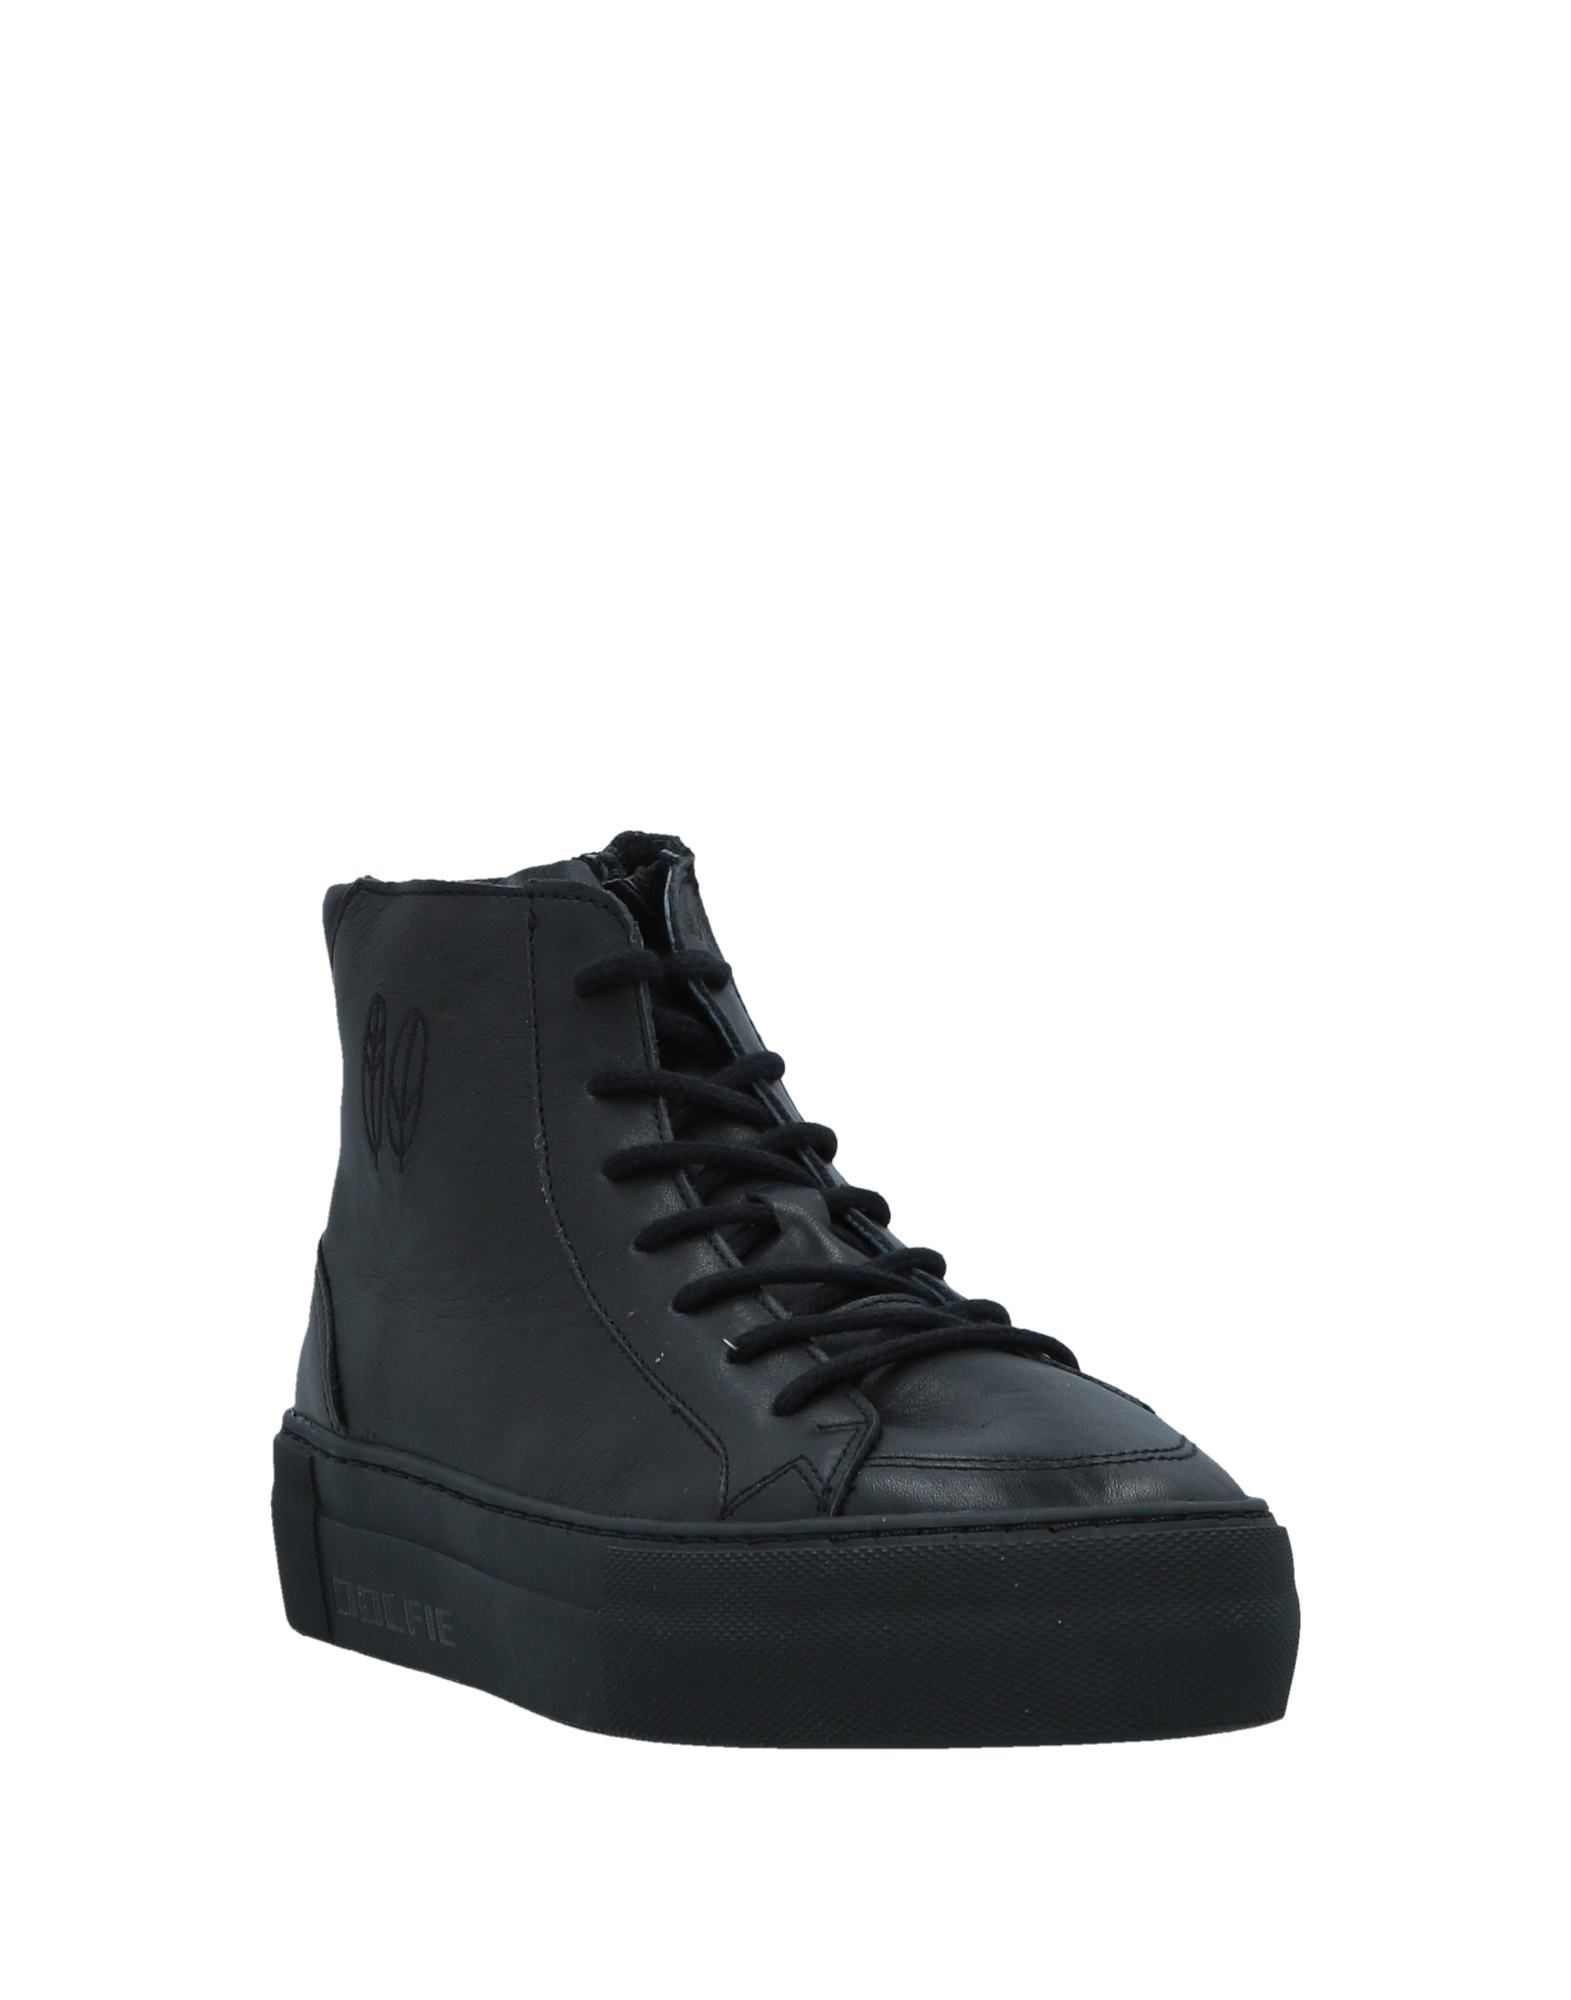 Dolfie Sneakers 11529067FS Damen  11529067FS Sneakers Gute Qualität beliebte Schuhe 4bcc64